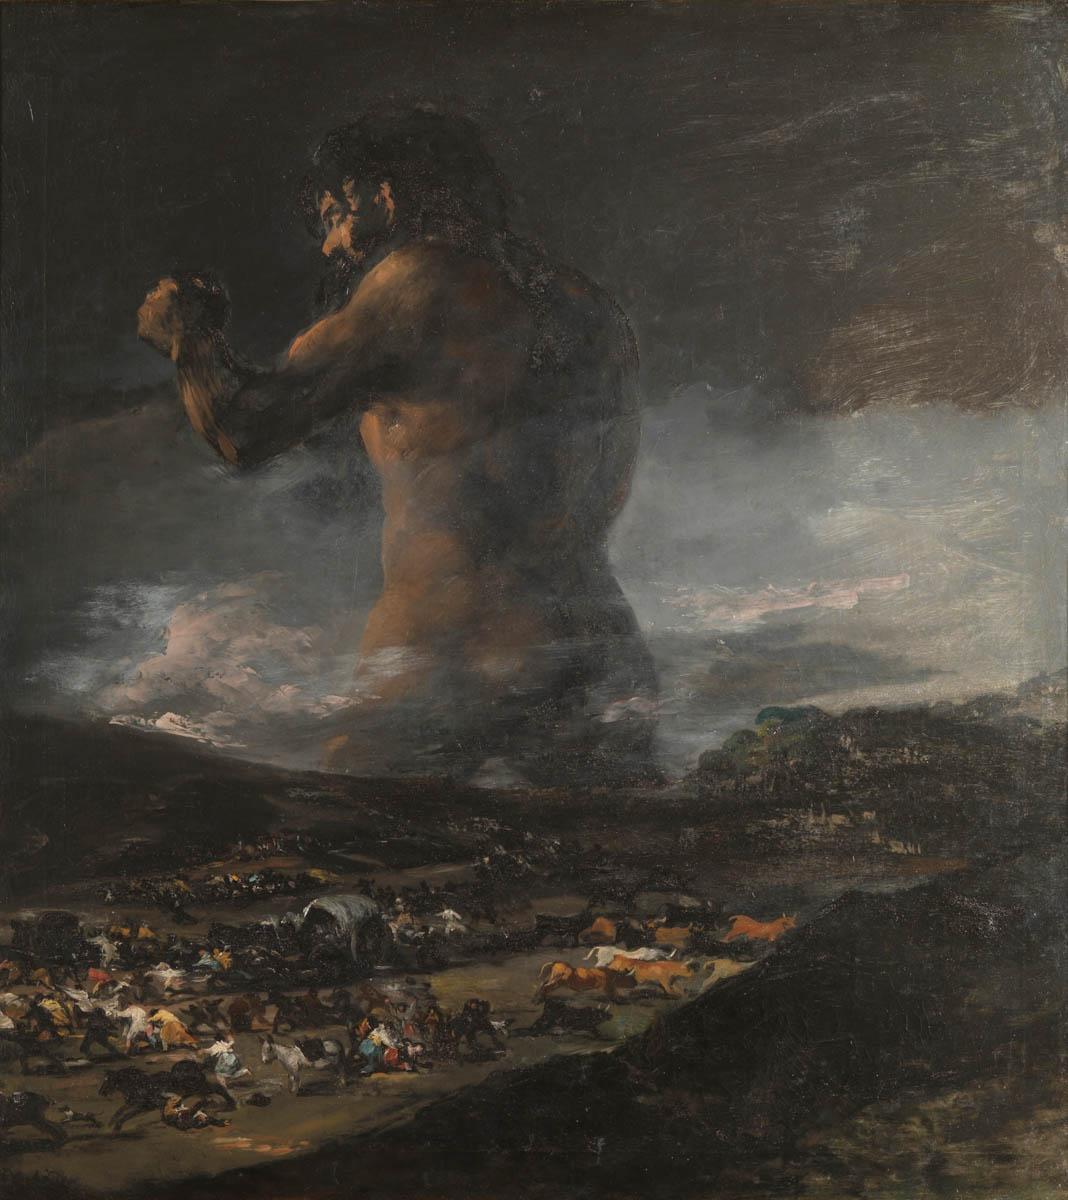 Figure 20. Goya, Gigante.